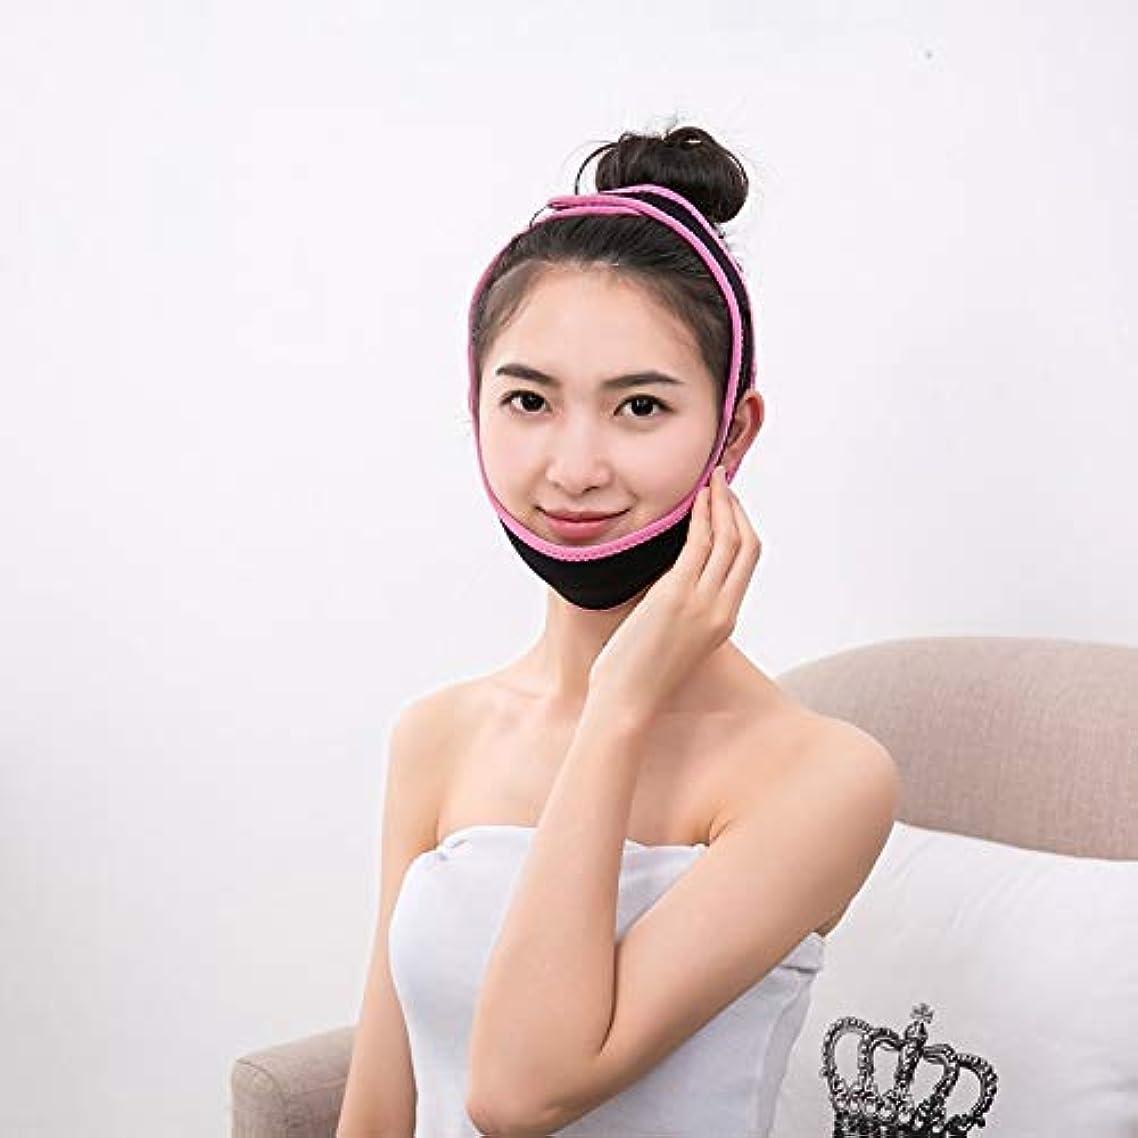 HUYYA フェイスリフティング包帯、フェイスマスク V字ベルト補正ベルト ダブルチンヘルスケア,Pink_Large